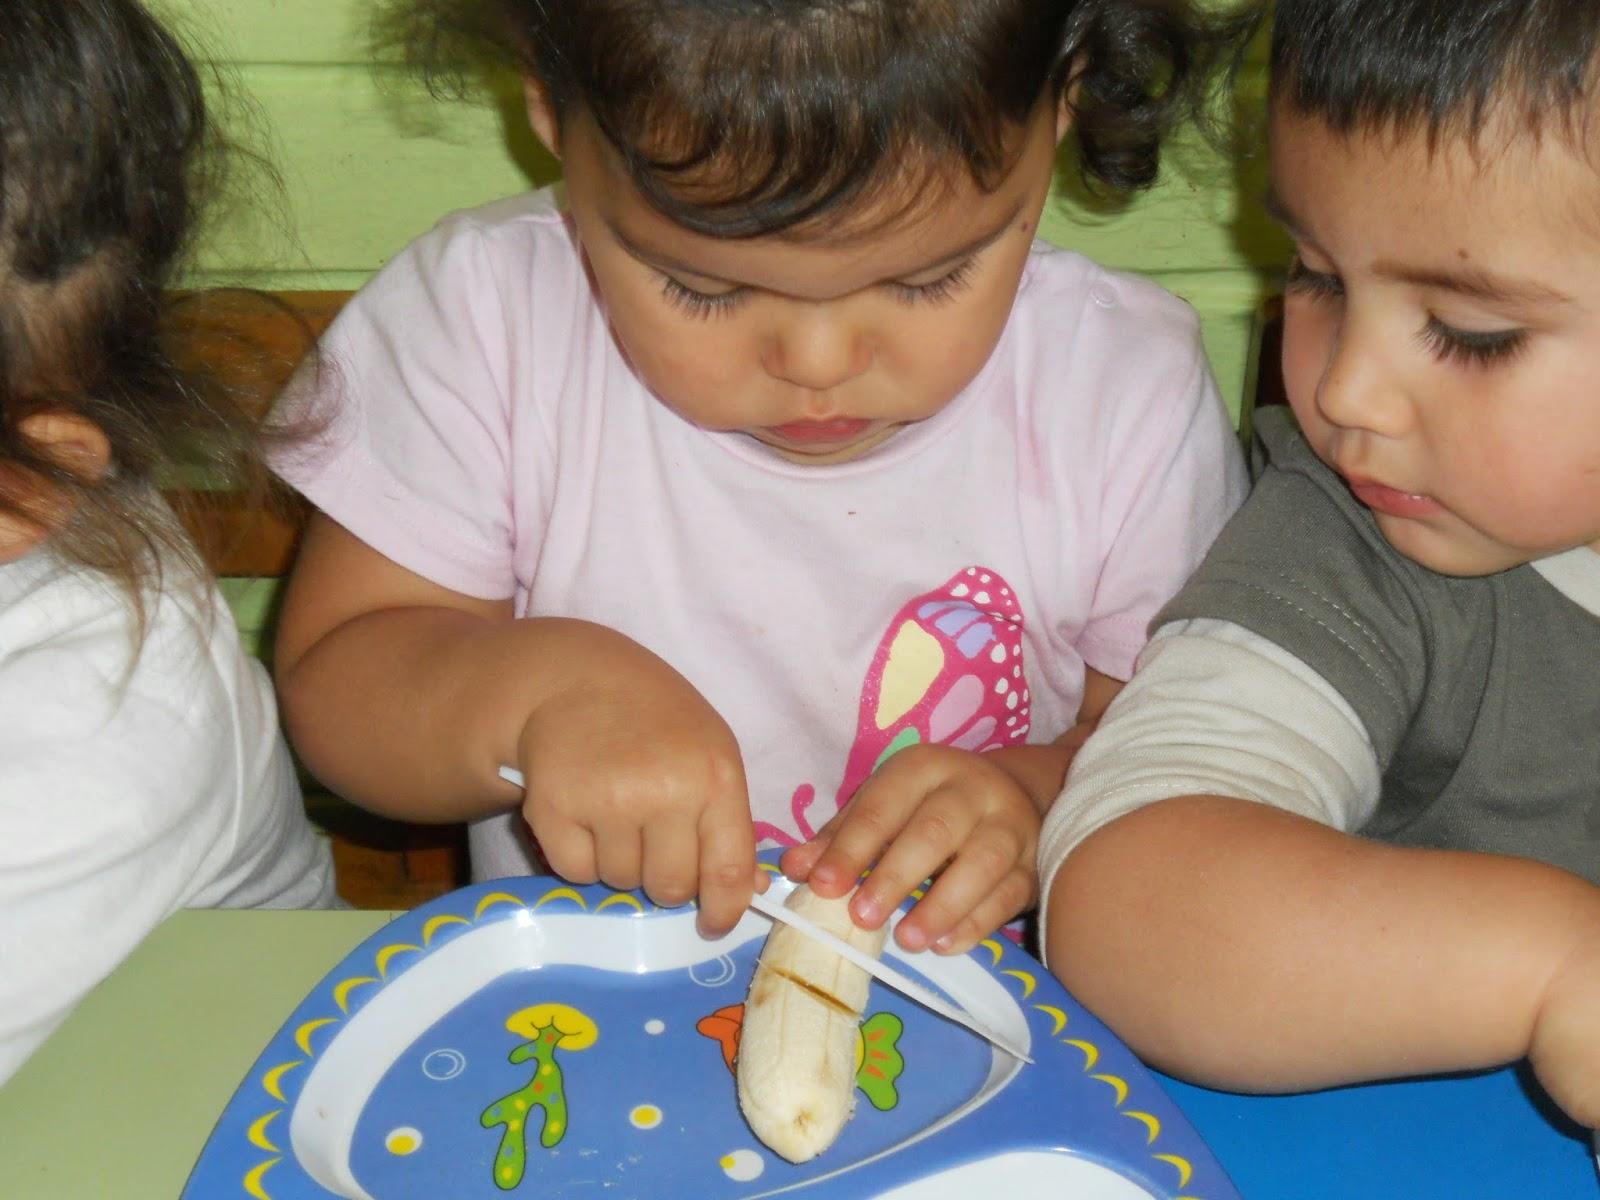 Jard n infantil un mundo de amor nuestras actividades for Jardin infantil serrano 78